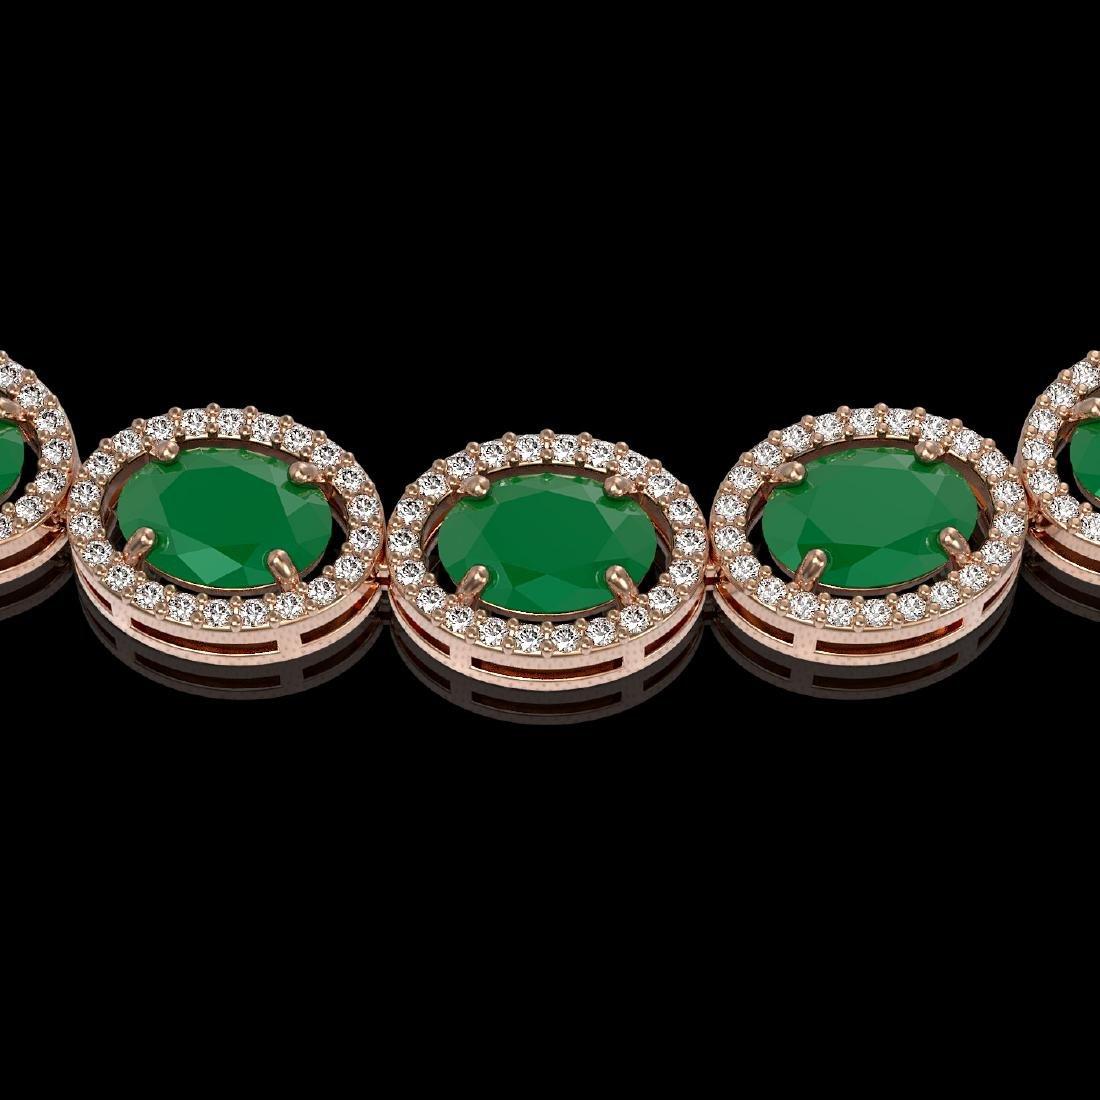 52.15 CTW Emerald & Diamond Halo Necklace 10K Rose Gold - 3